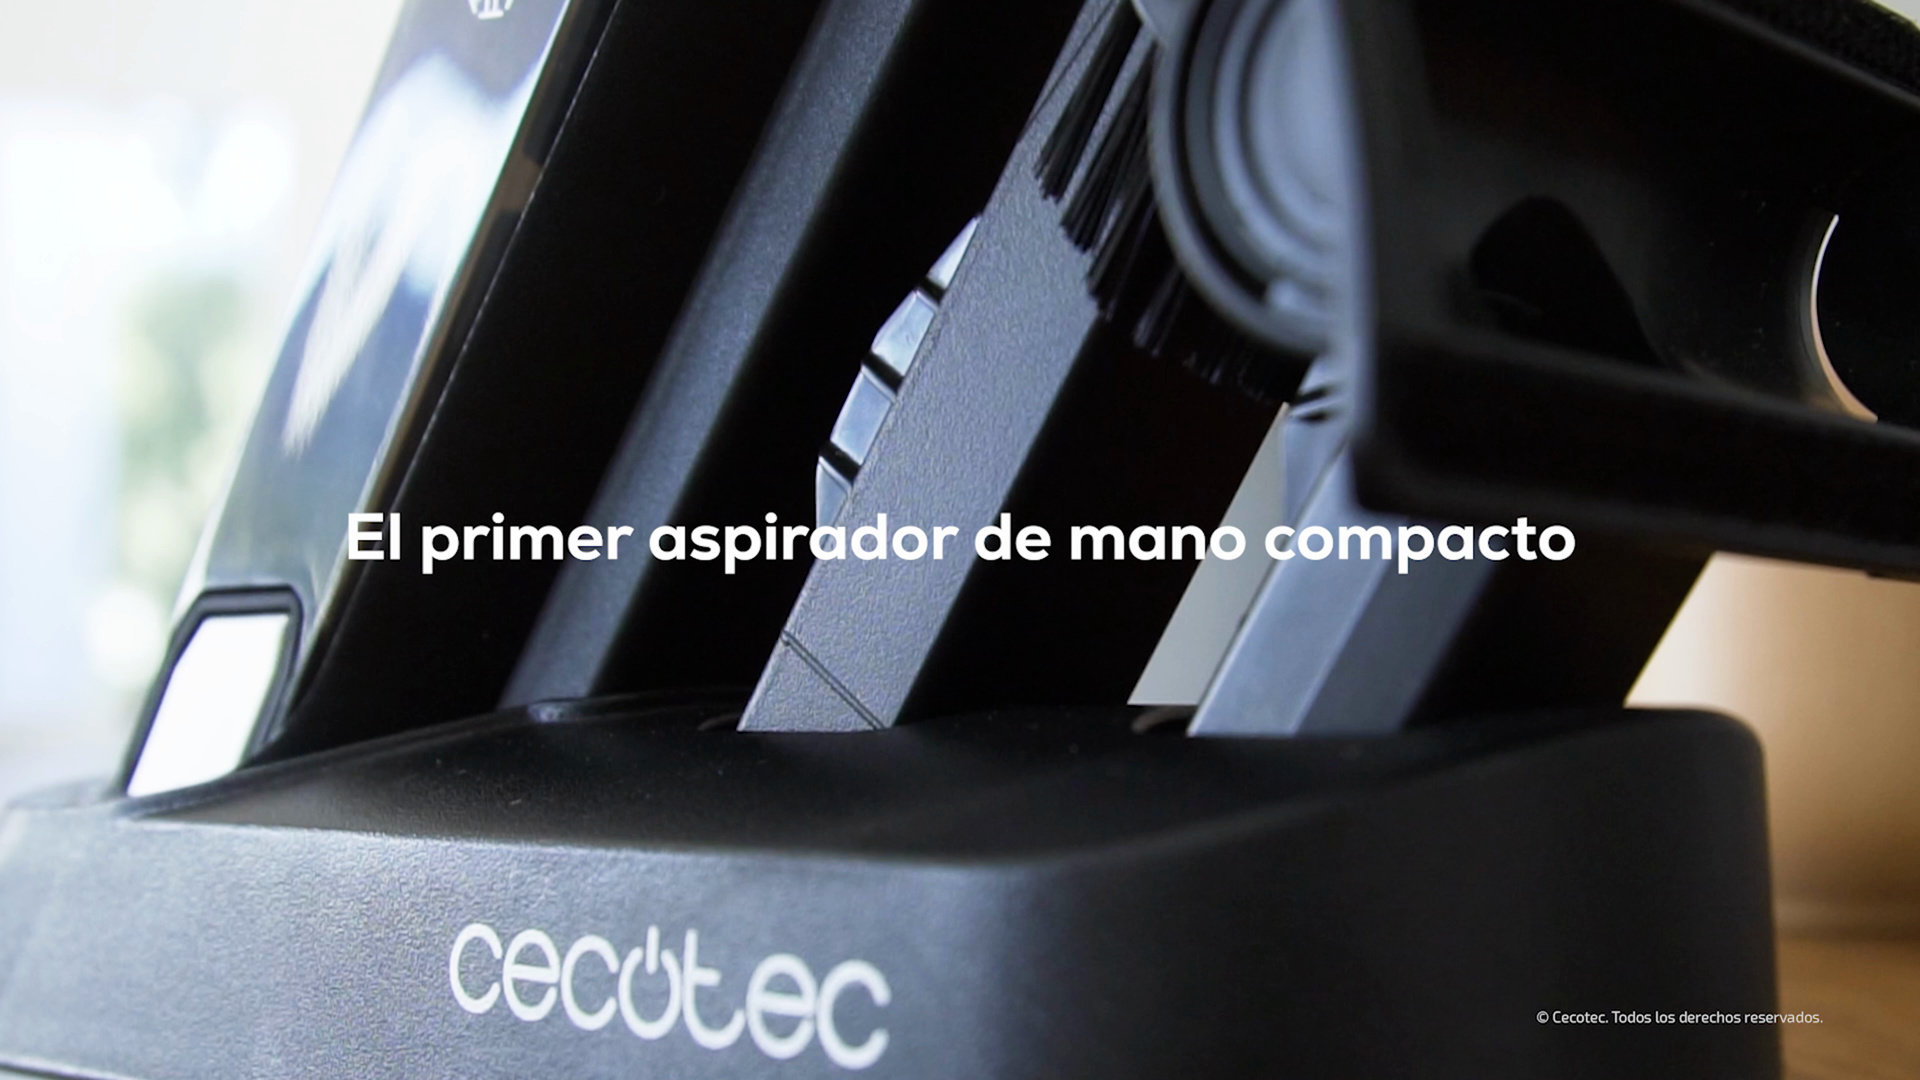 Cecotec Conga Rockstar Micro 8000. Aspirador de Mano, Motor Digital brushless de 120 W, 14 kPa Poder de succión, Autonomía hasta 20 Minutos, 2 Modos de Potencia: Amazon.es: Hogar